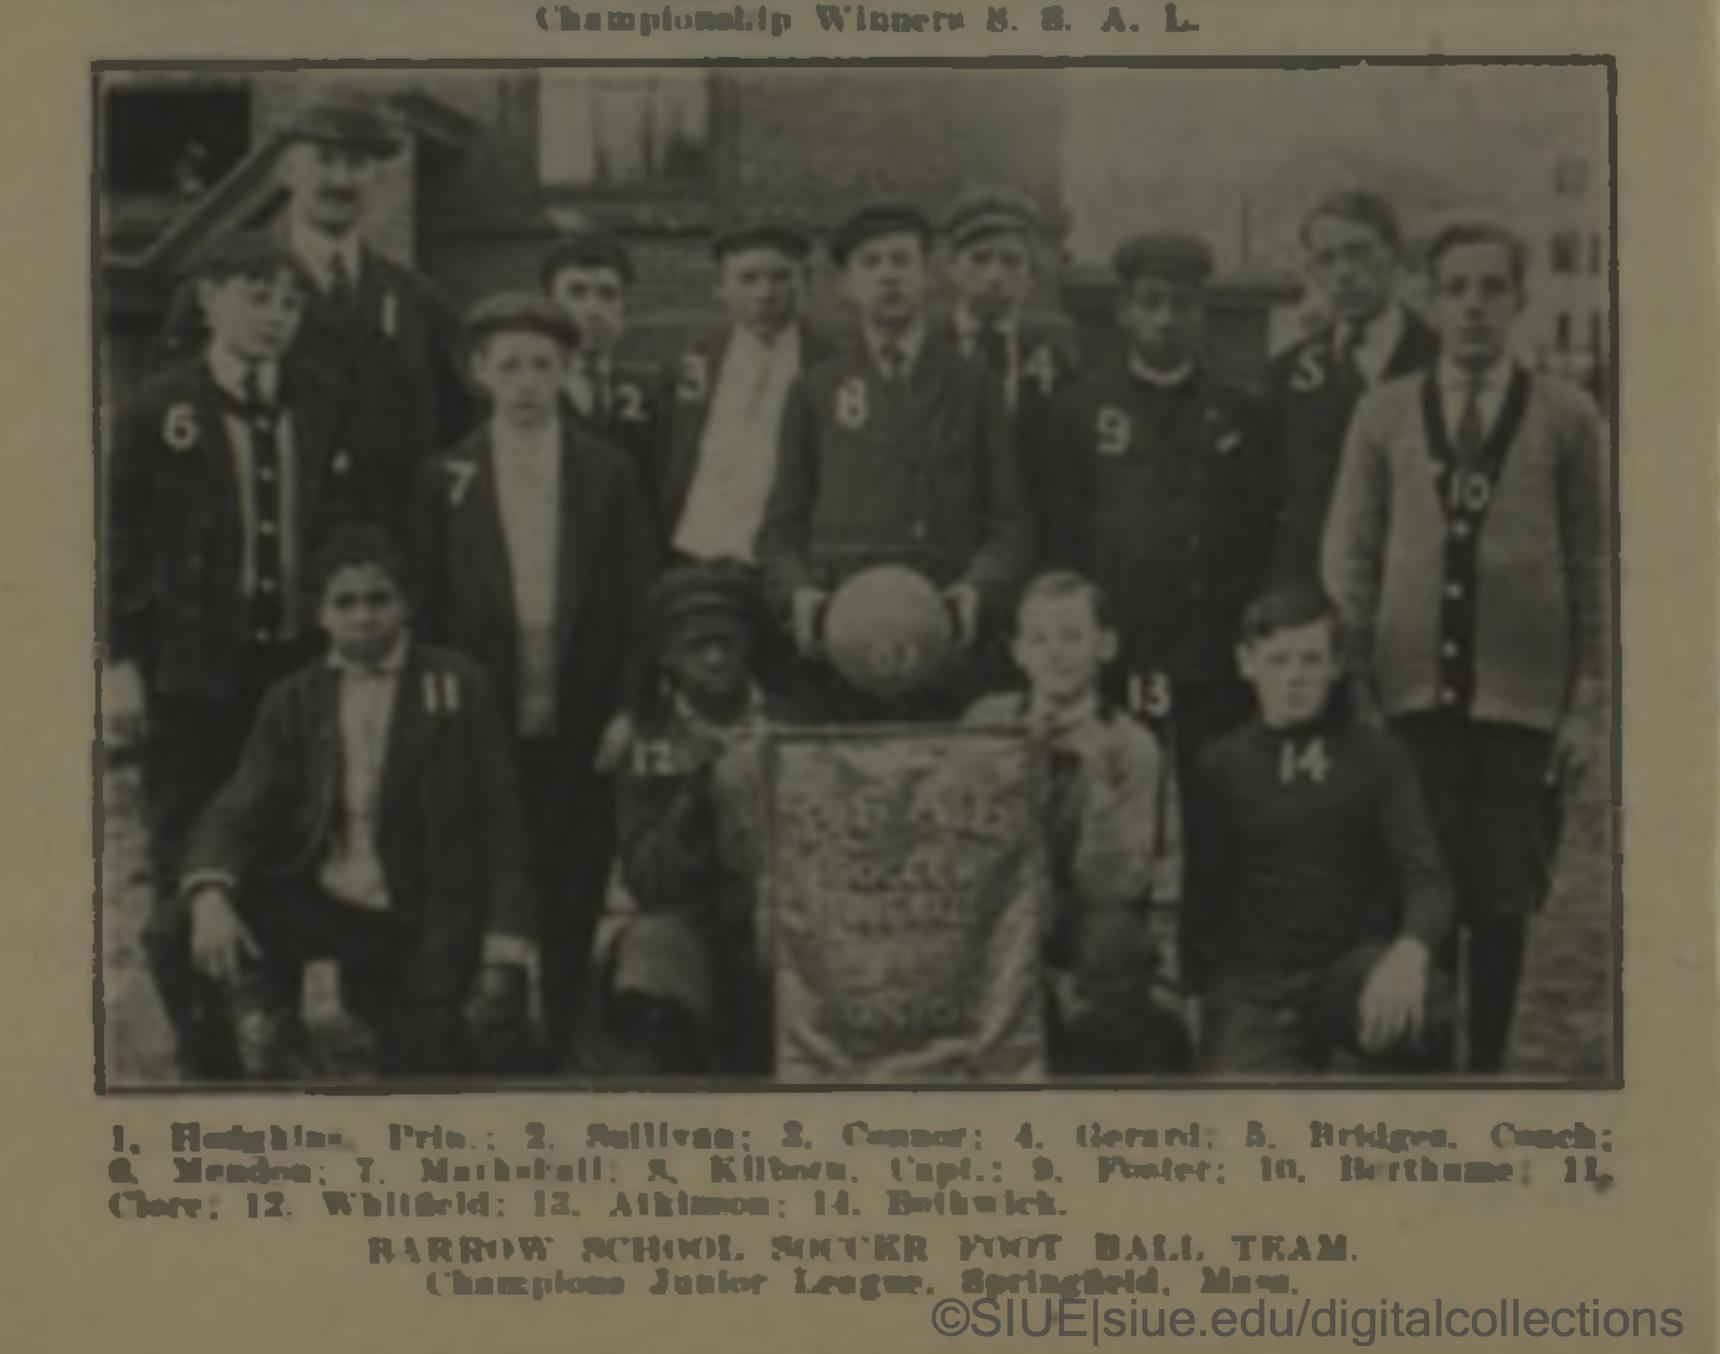 Photo of school boy soccer team